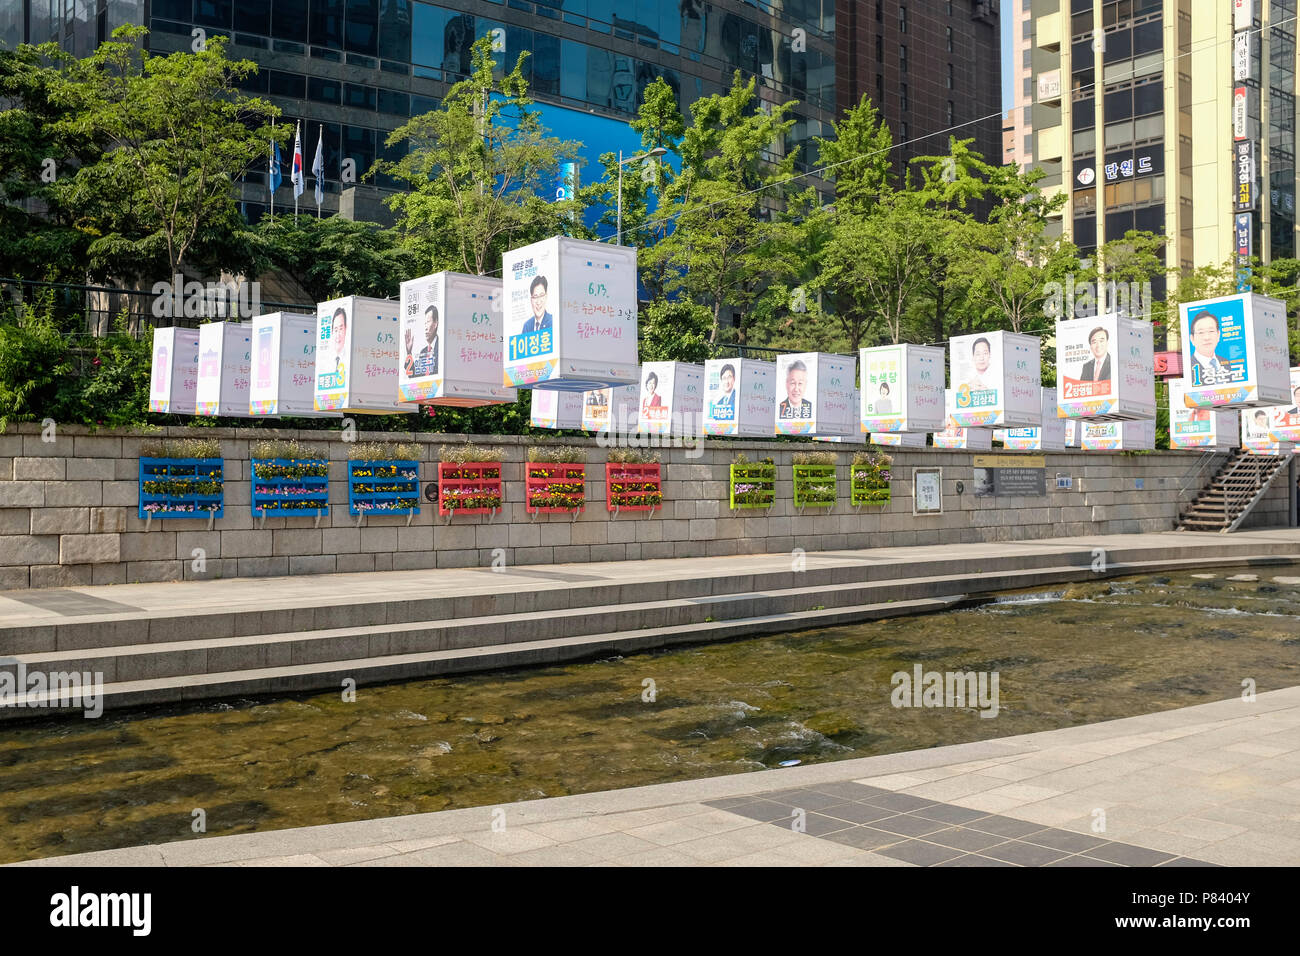 Cheonggyecheon stream in Seoul, South Korea. An area of massive urban renewal. - Stock Image